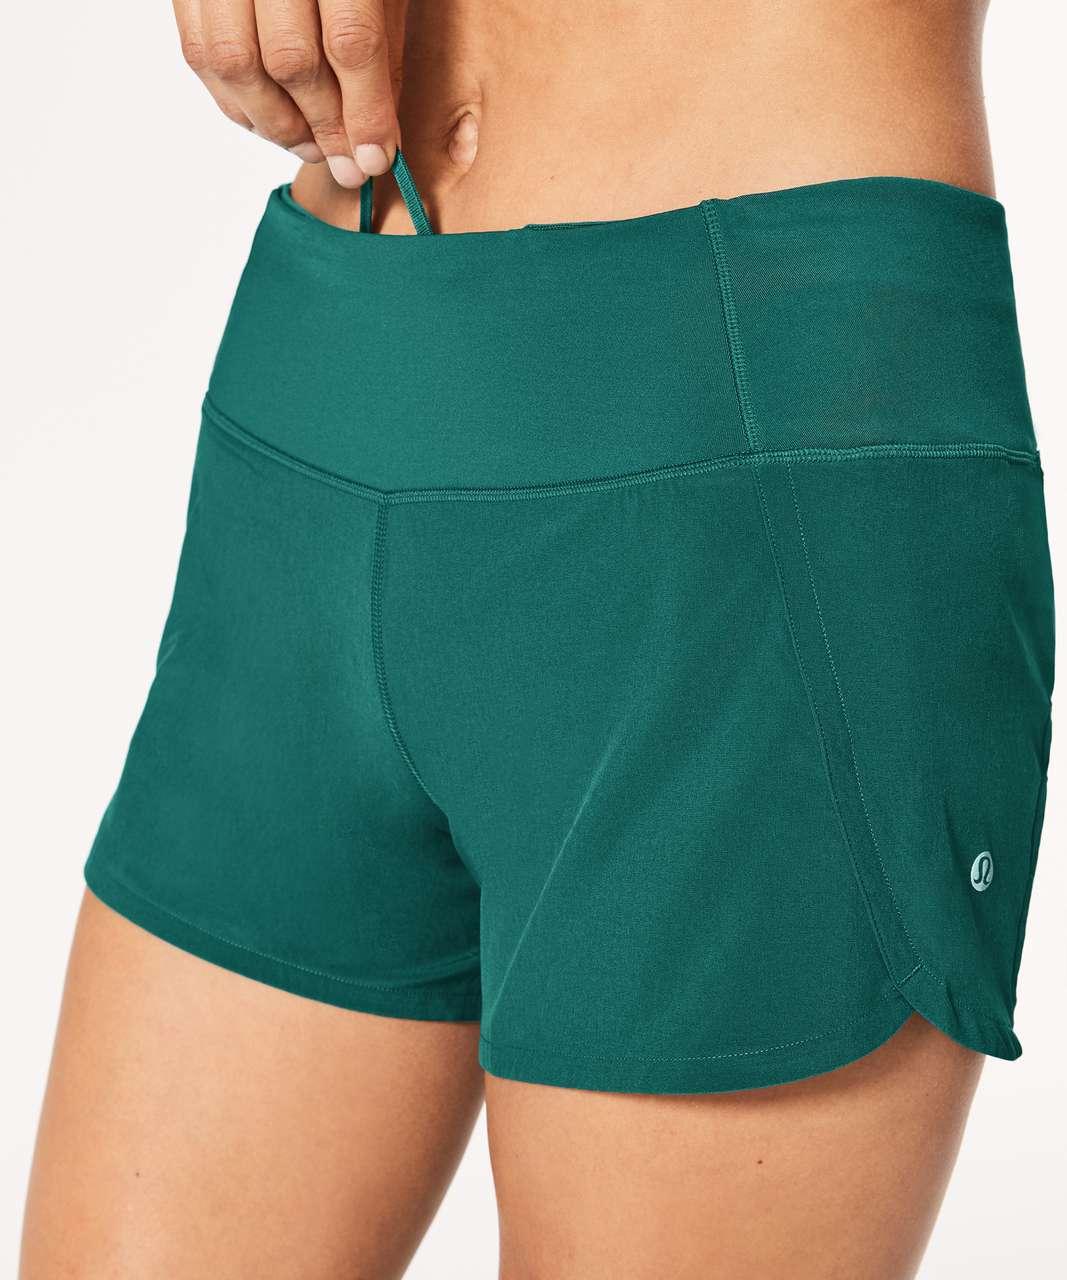 "Lululemon Run Times Short II *4"" - Teal Green"